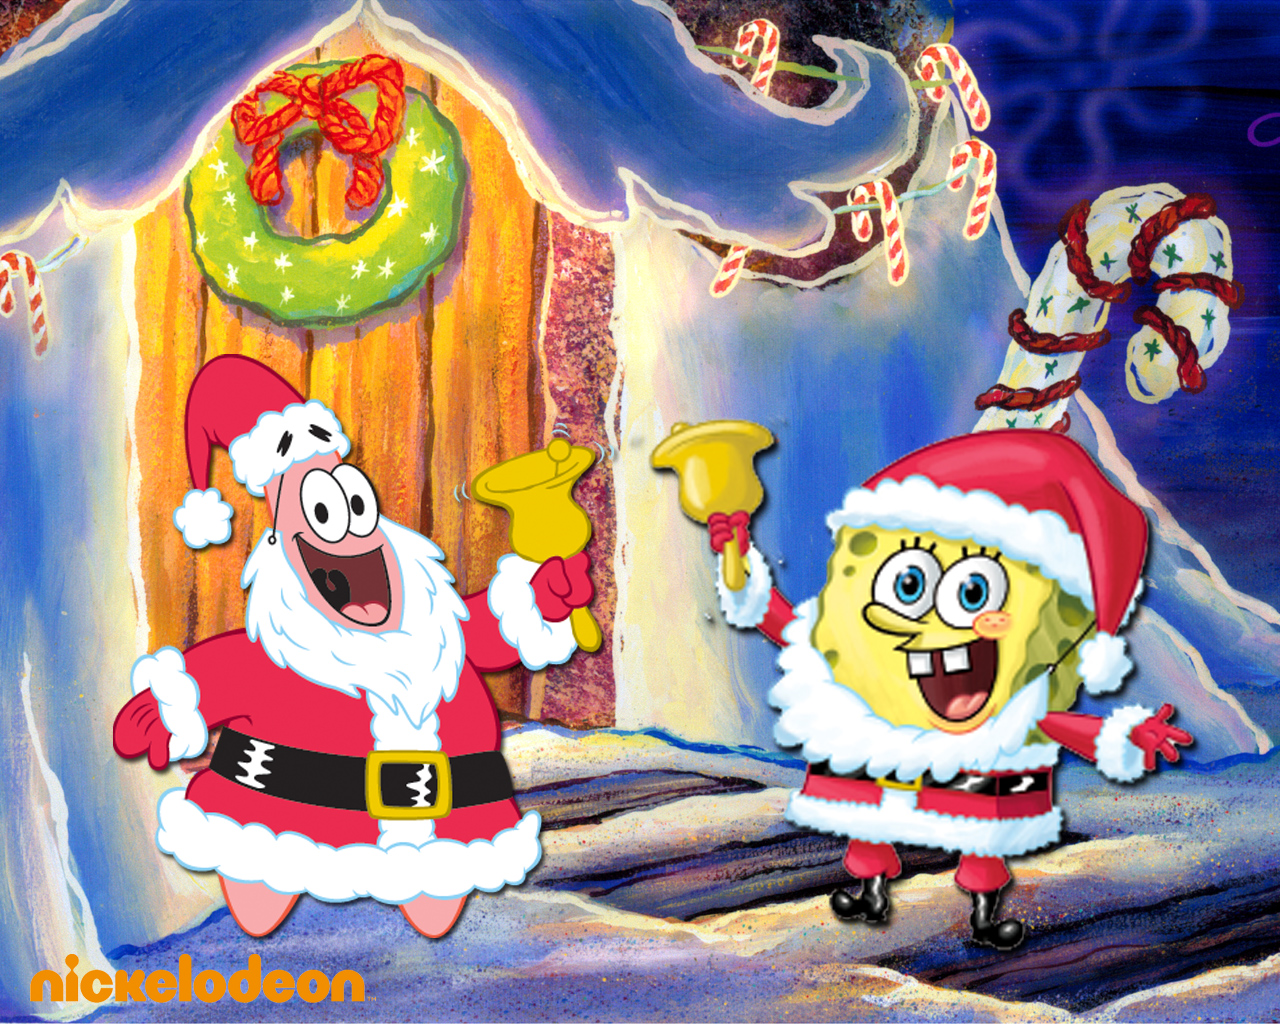 Spongebob Christmas.Spongebob Christmas Wallpaper Spongebob Squarepants